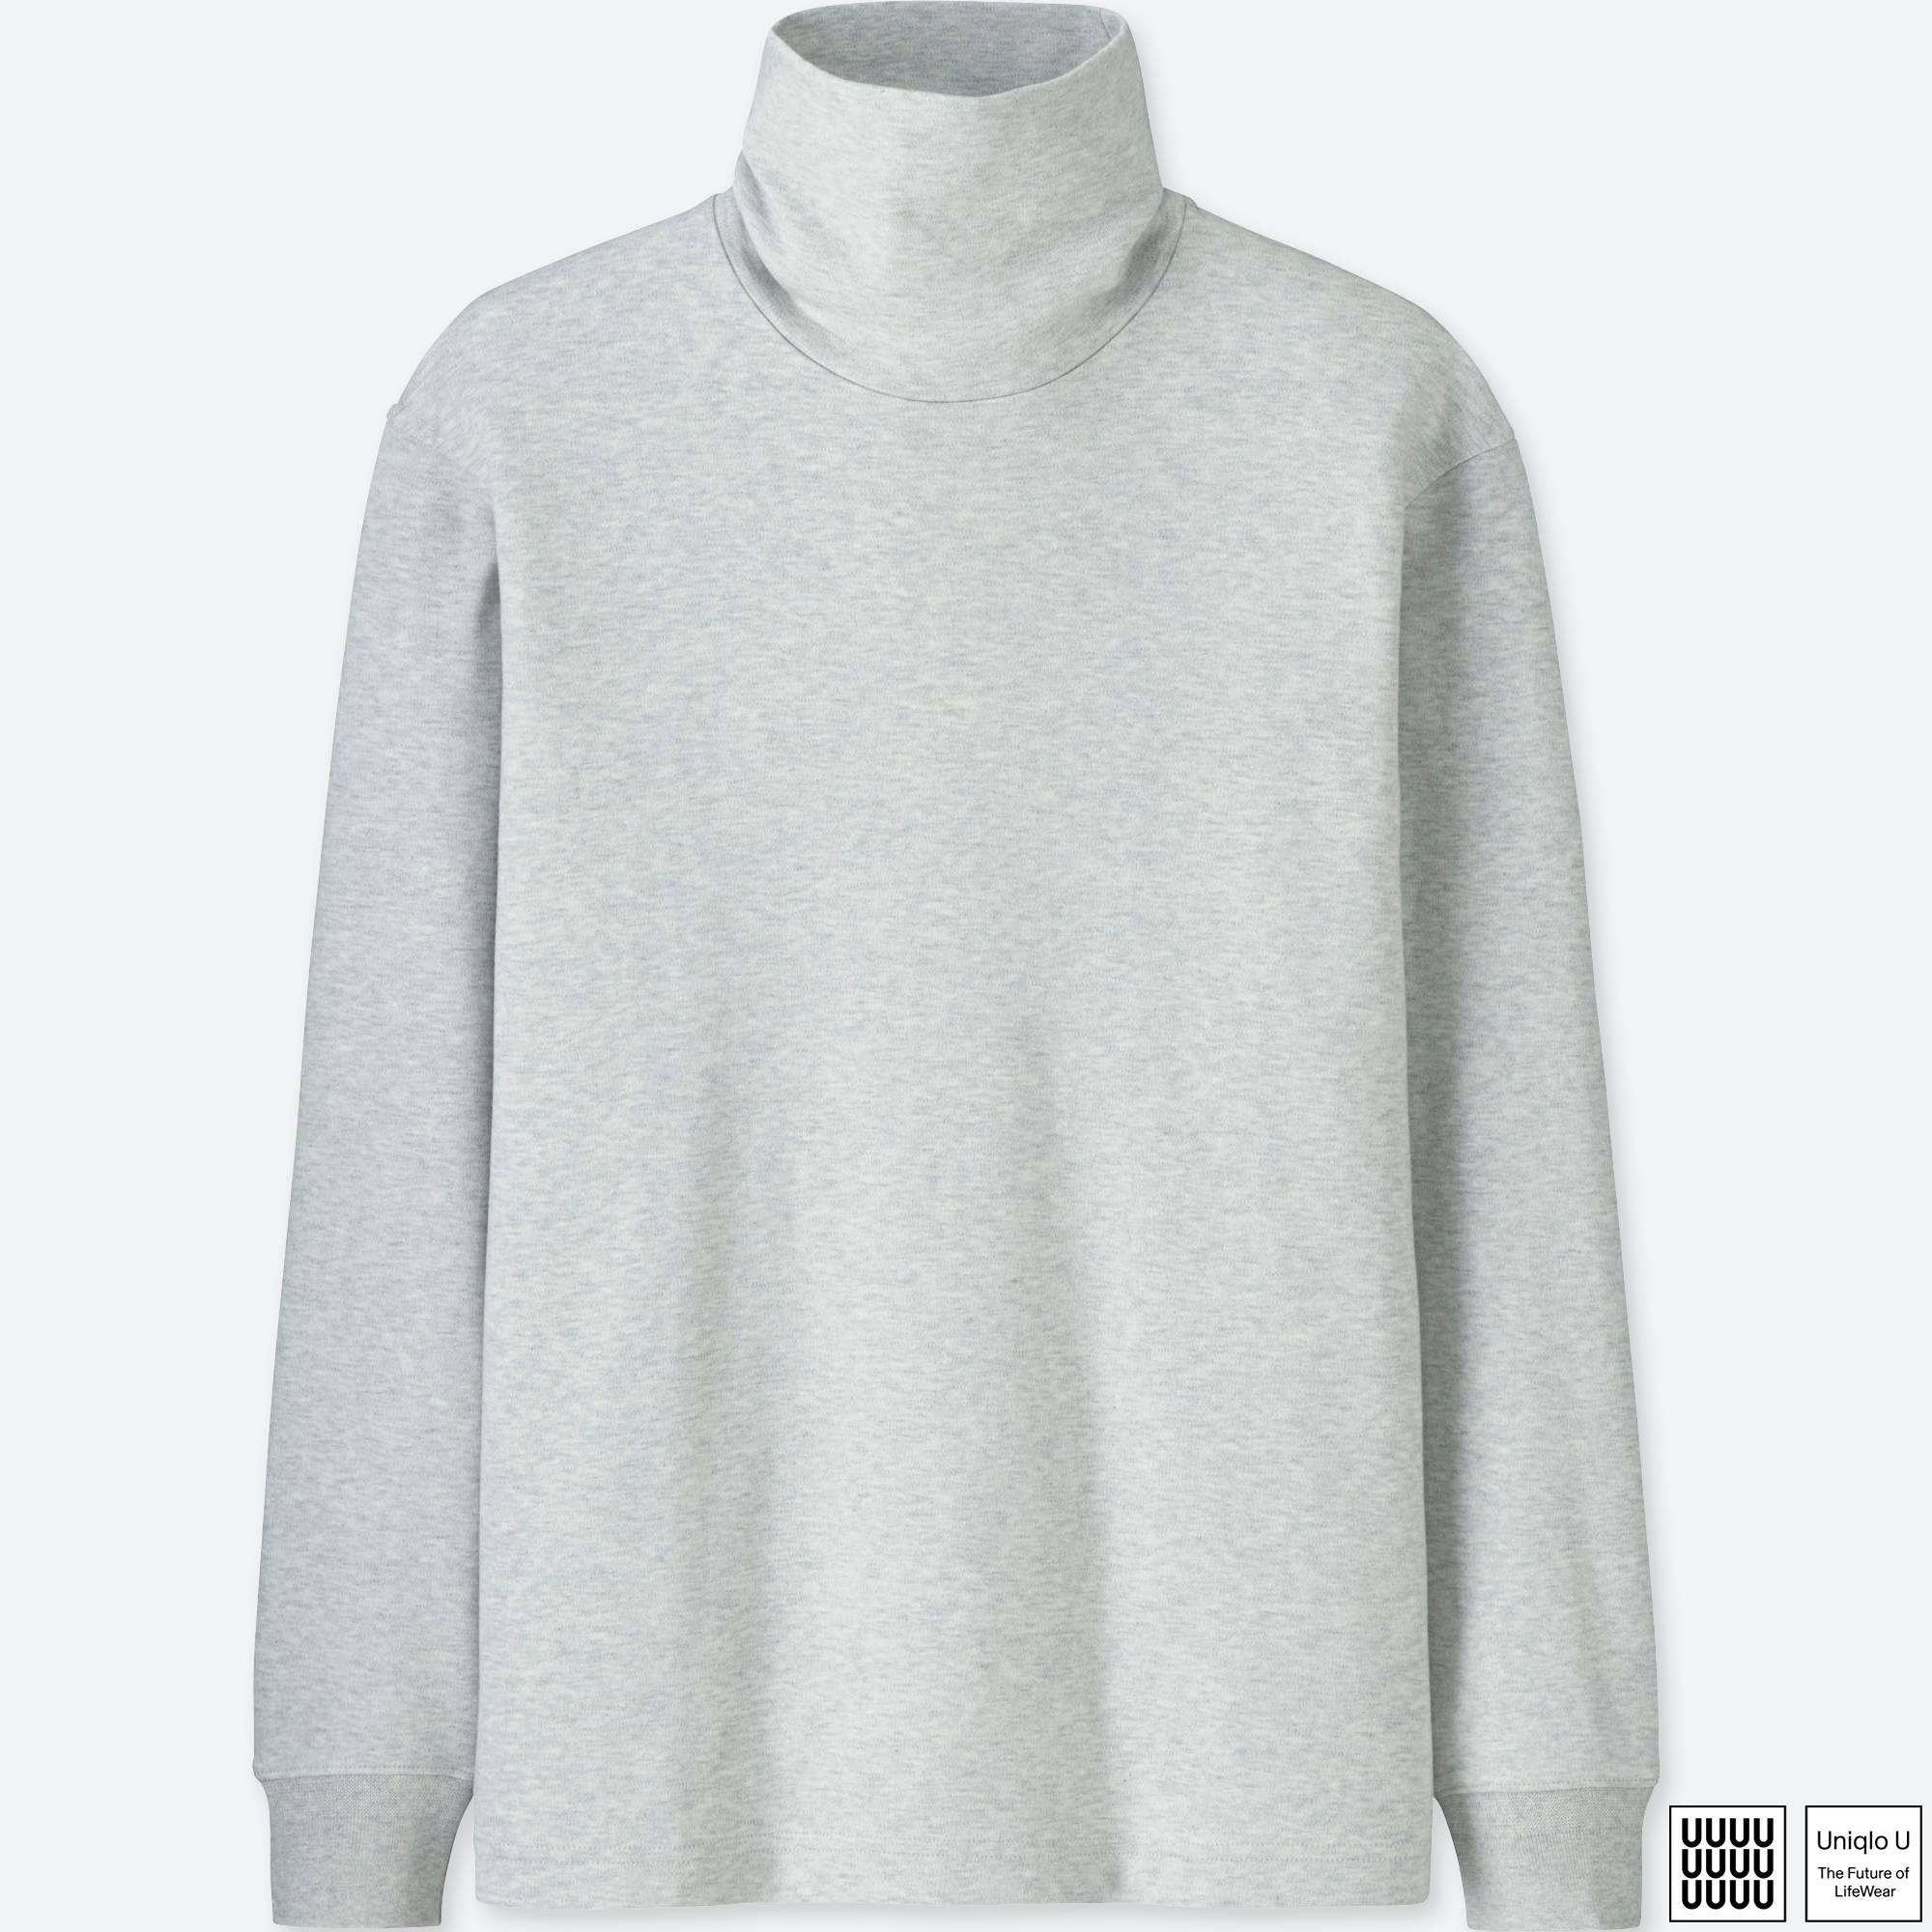 9ff96b5ac2 Lyst - Uniqlo Men U Double Face Turtleneck Long-sleeve T-shirt in ...